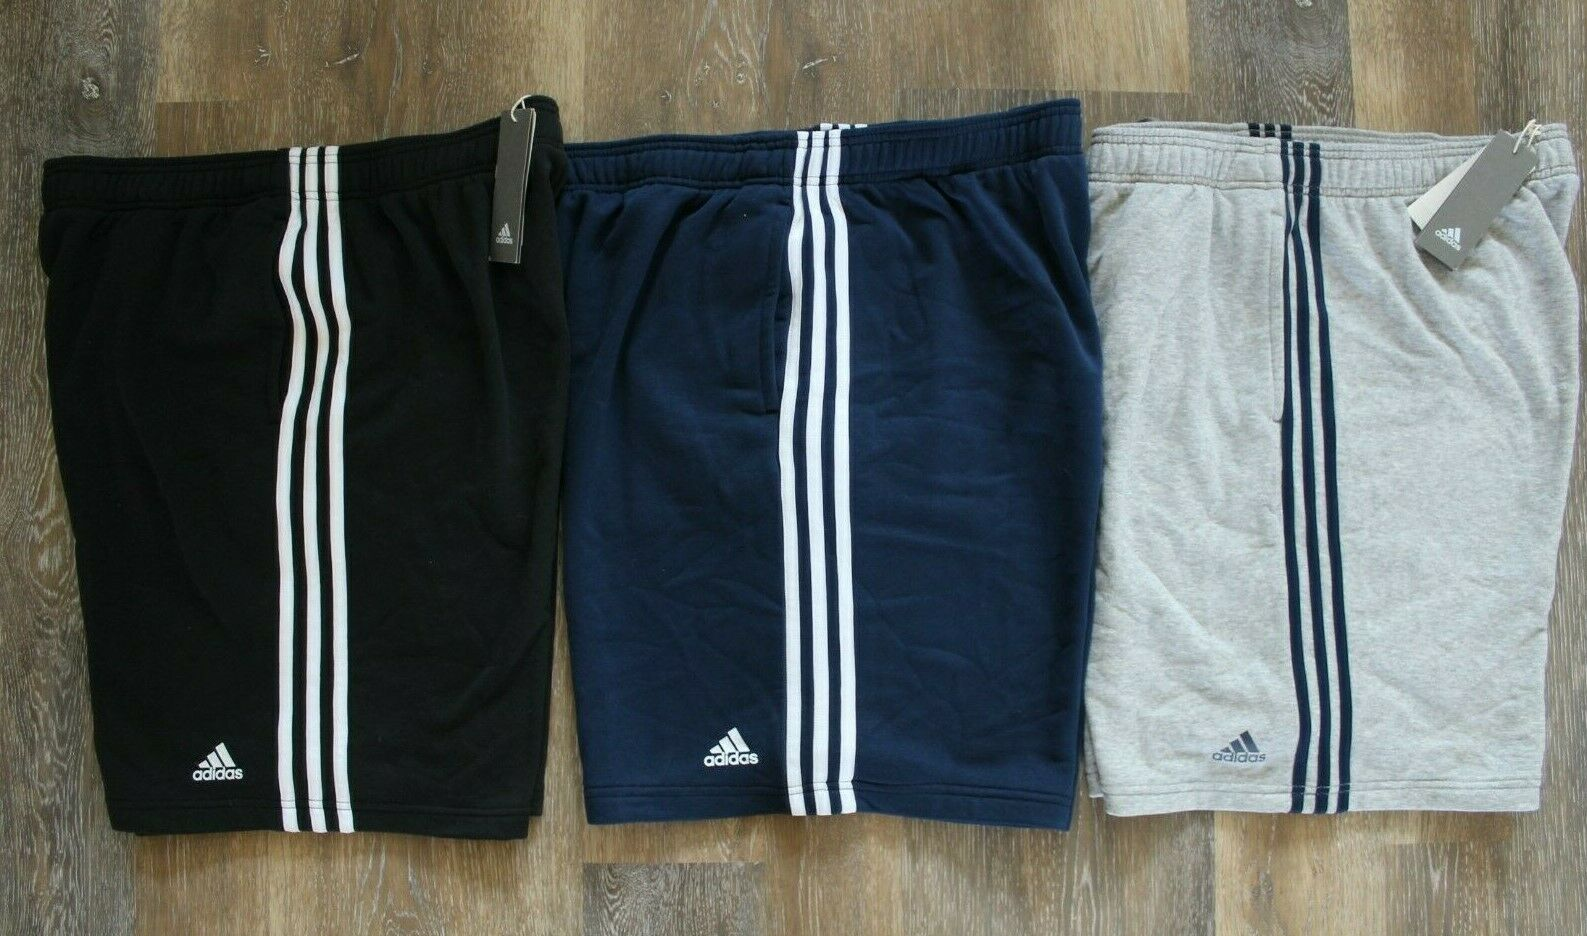 NWT Adidas Men's Logo Fleece Shorts Black Blue Gray XL XXL